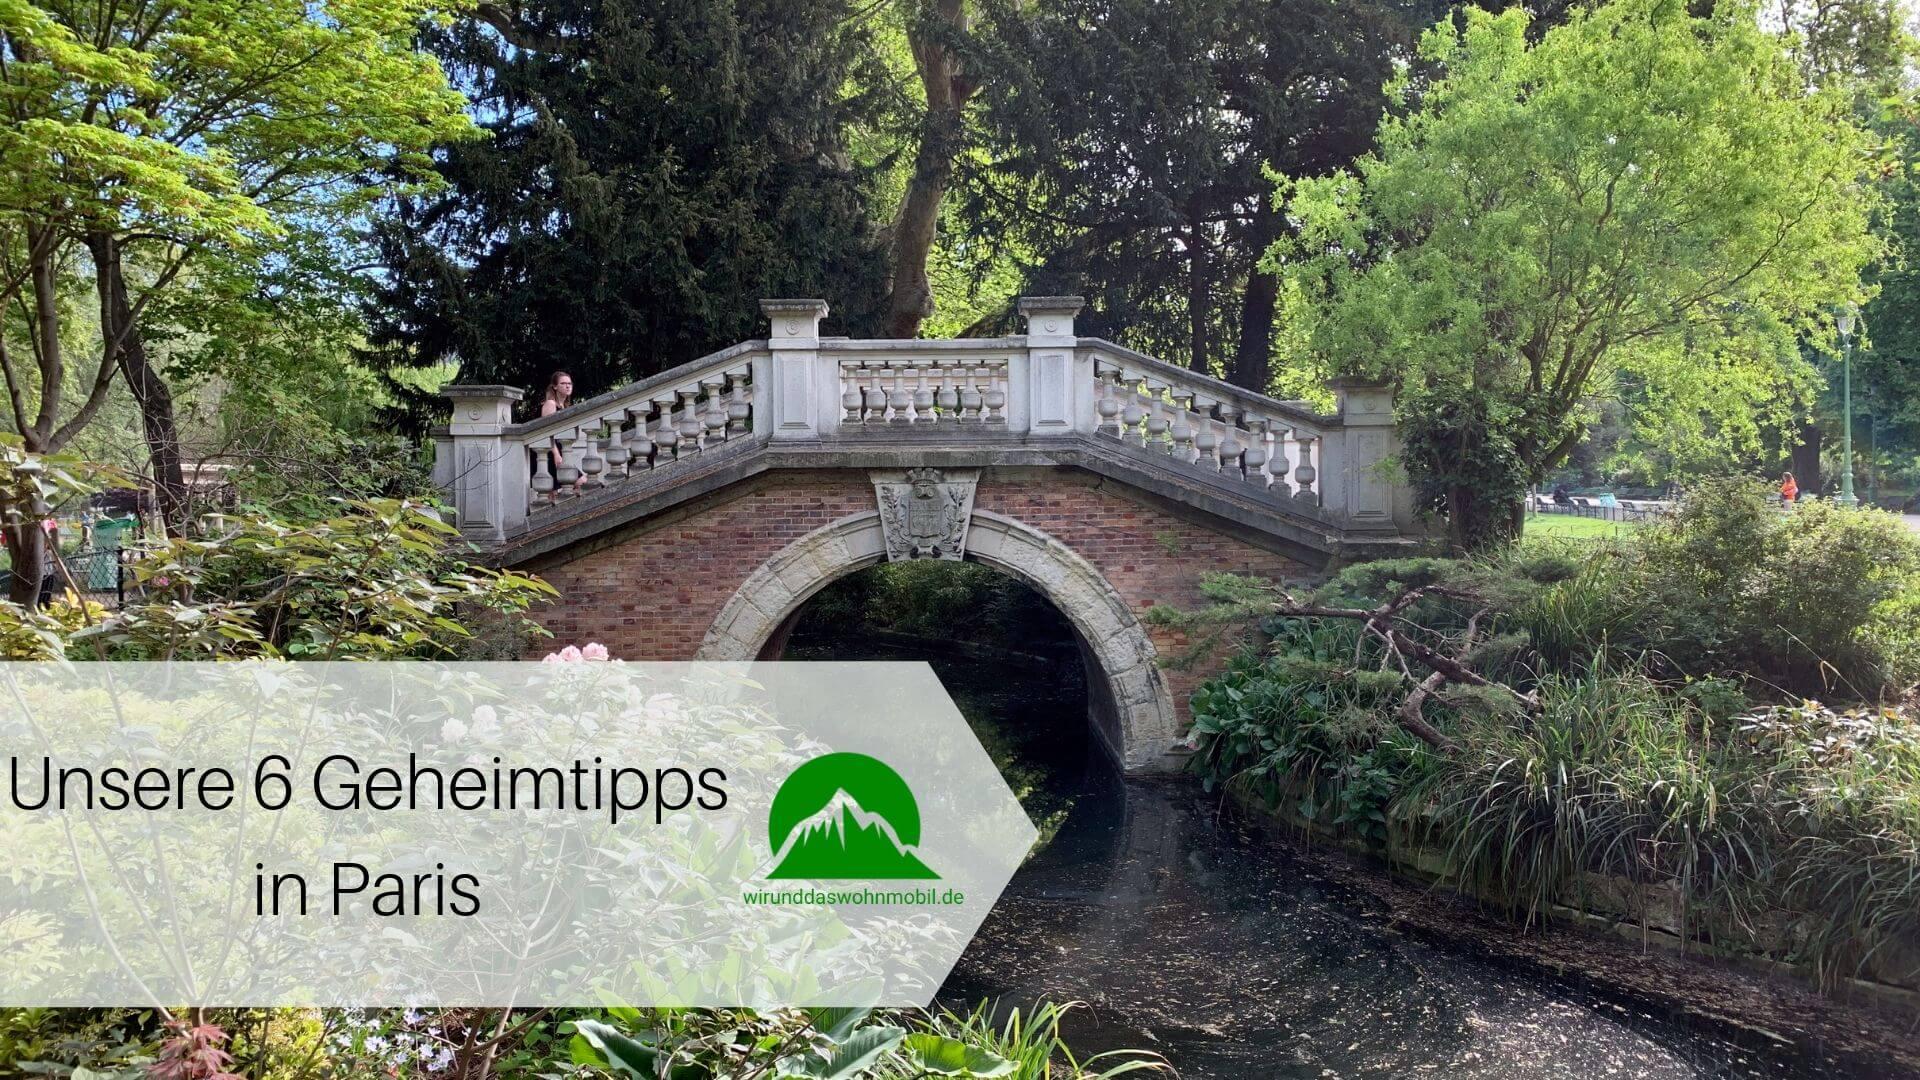 Titelbild Geheimtipps Paris Brücke Park in Paris